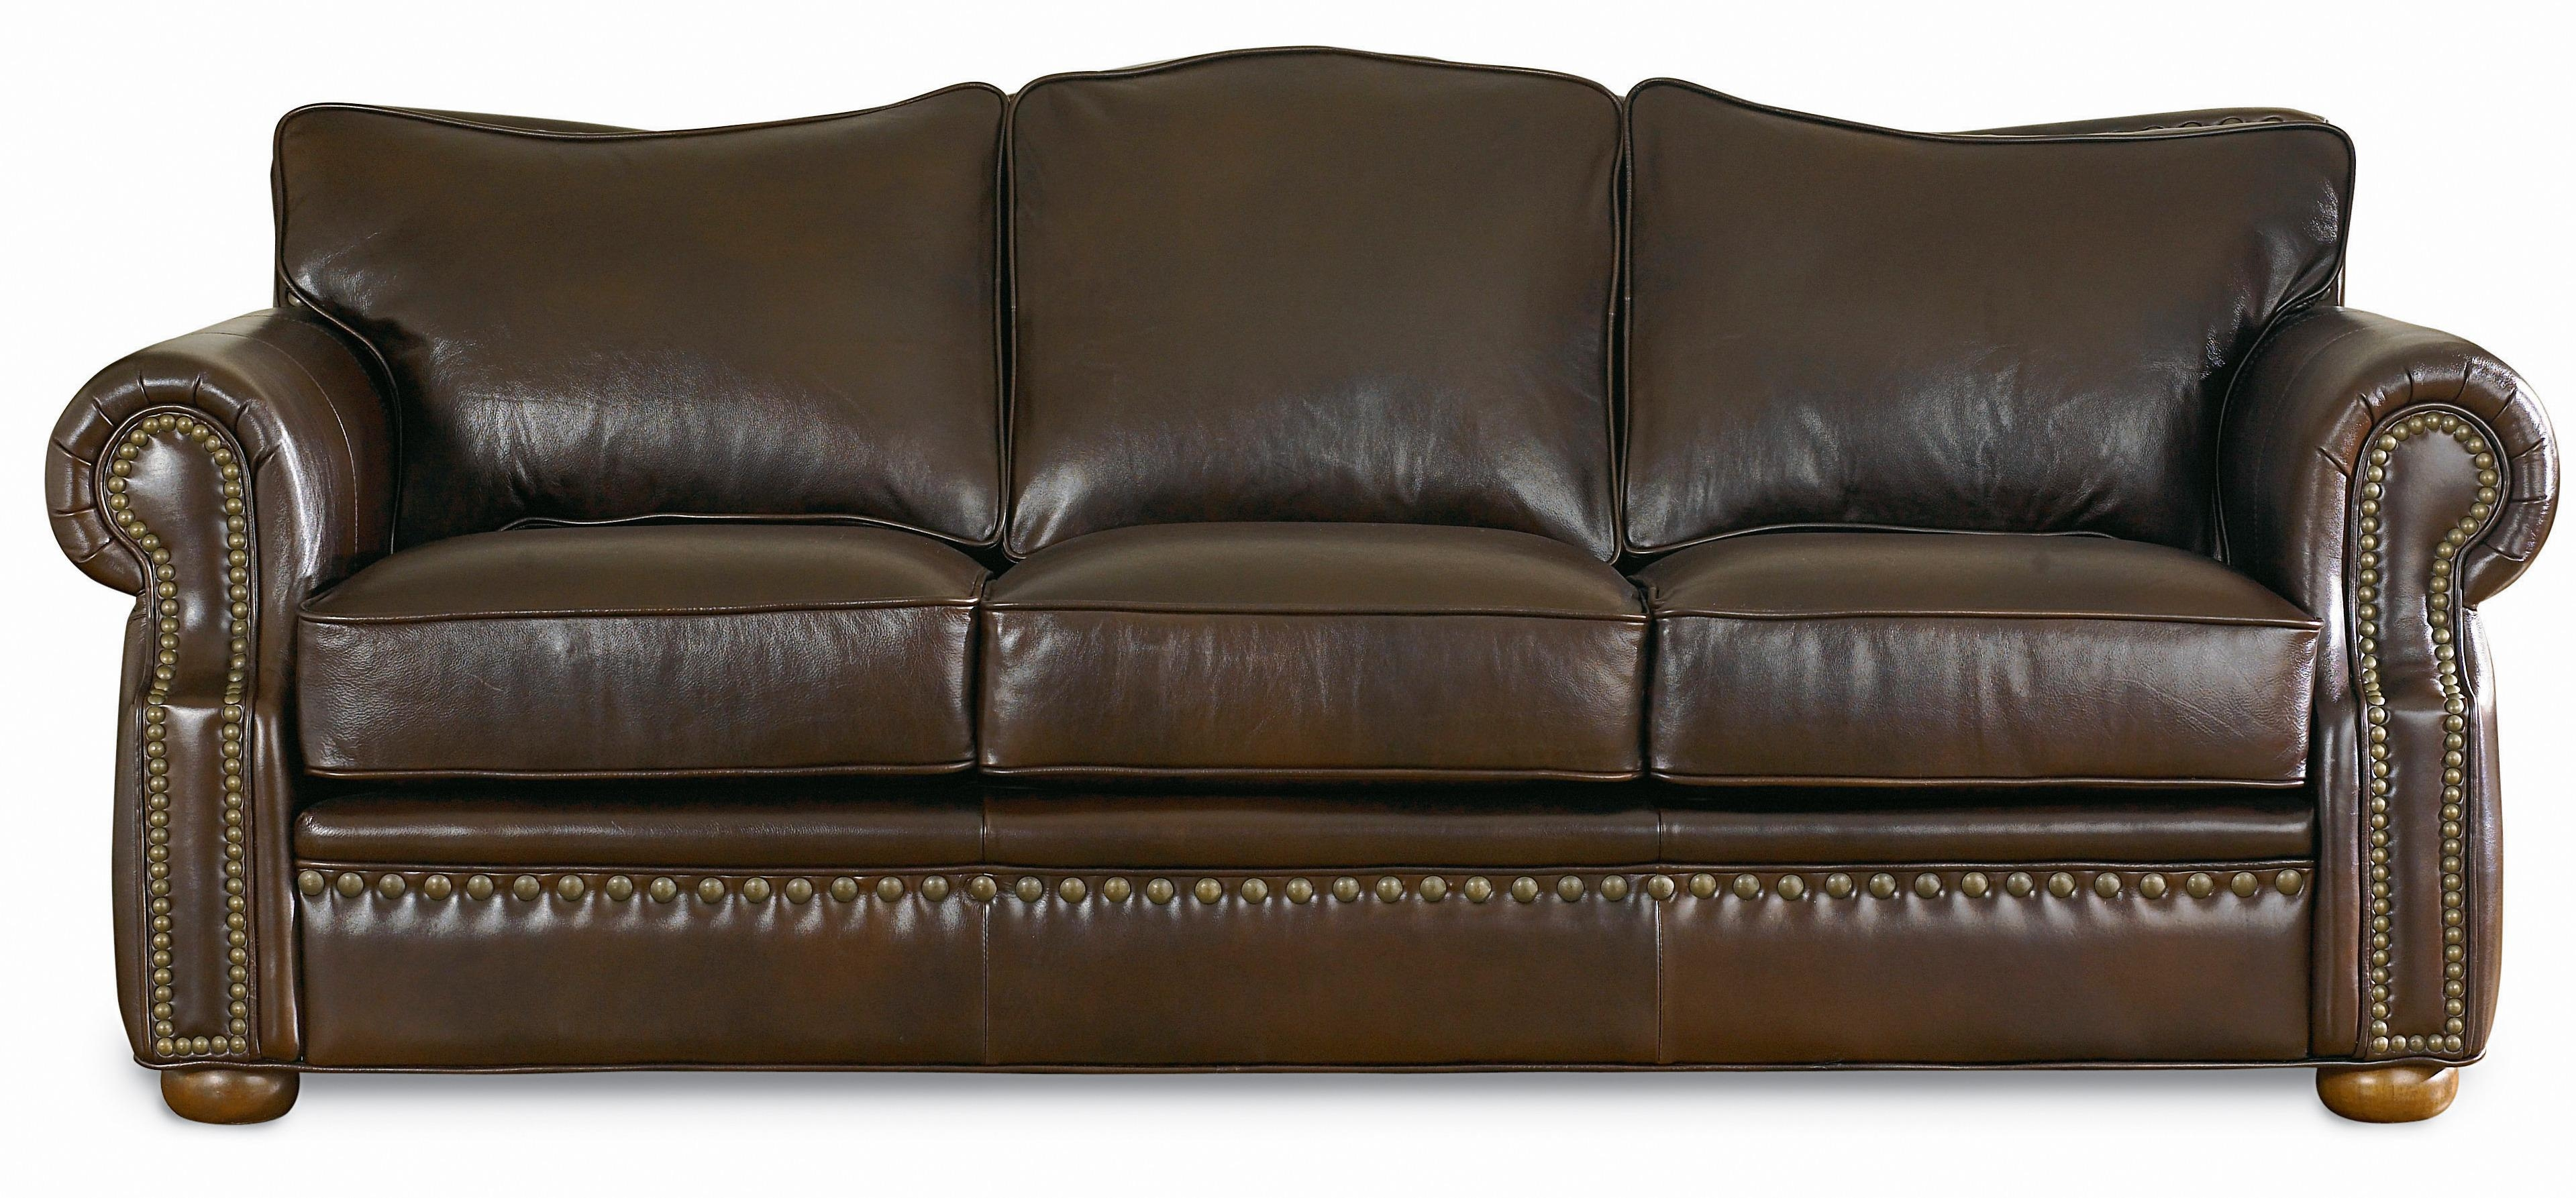 Sleeper Sofa Dallas | Sofa Gallery | Kengire Throughout Dallas Sleeper Sofas (Image 7 of 20)